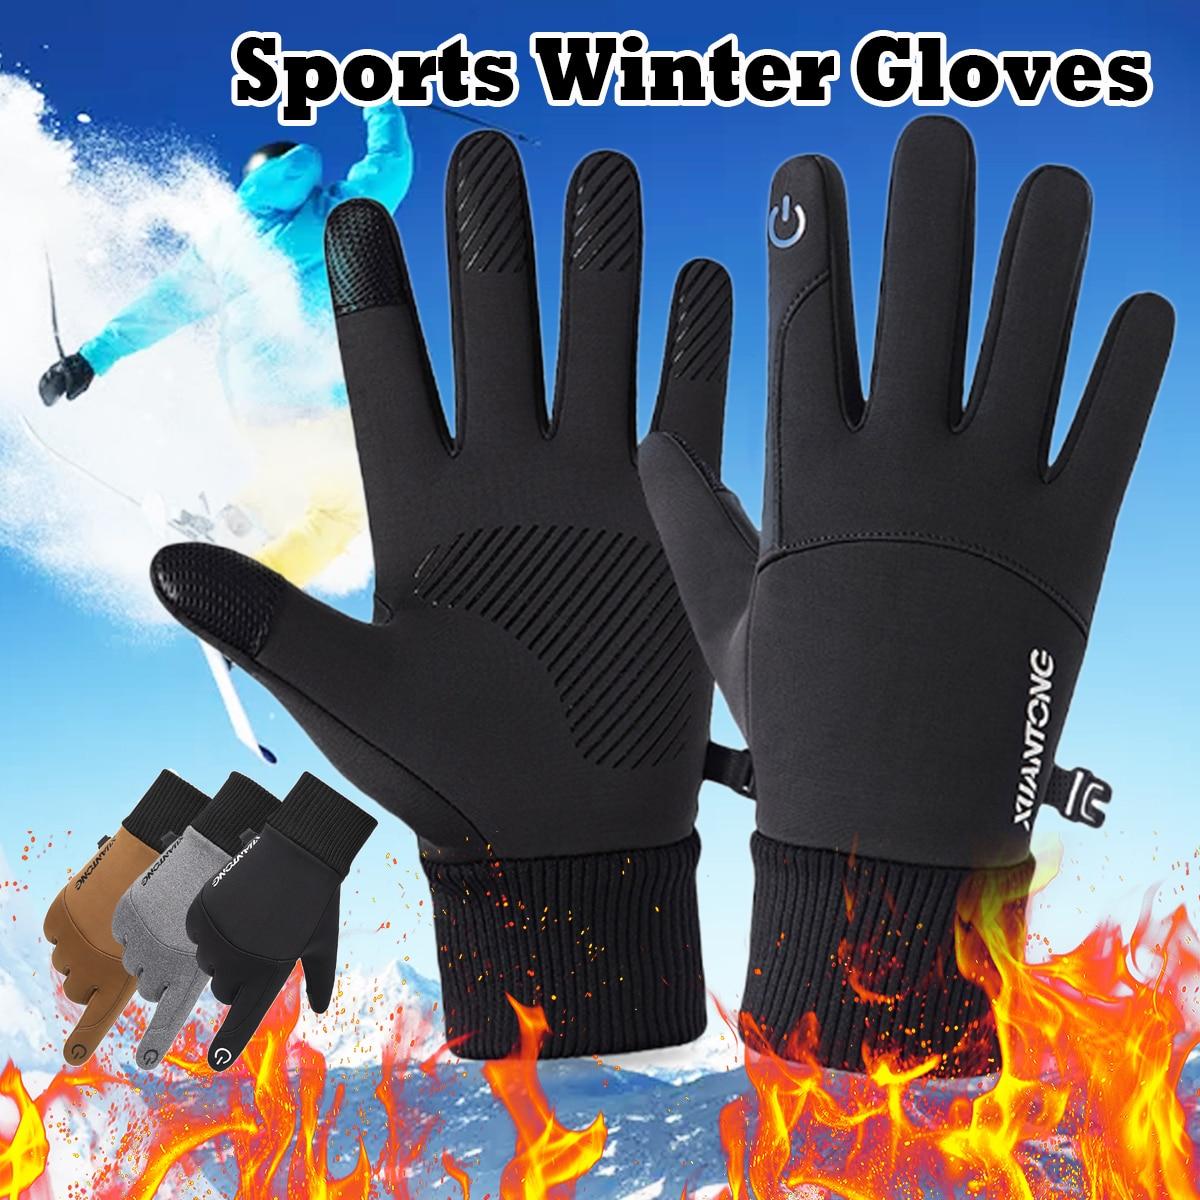 Winter Thermal Ski Gloves Men Women Fleece Touch Screen Snowboard Gloves Outdoor Waterproof Snow Motorcycle Skiing Gloves